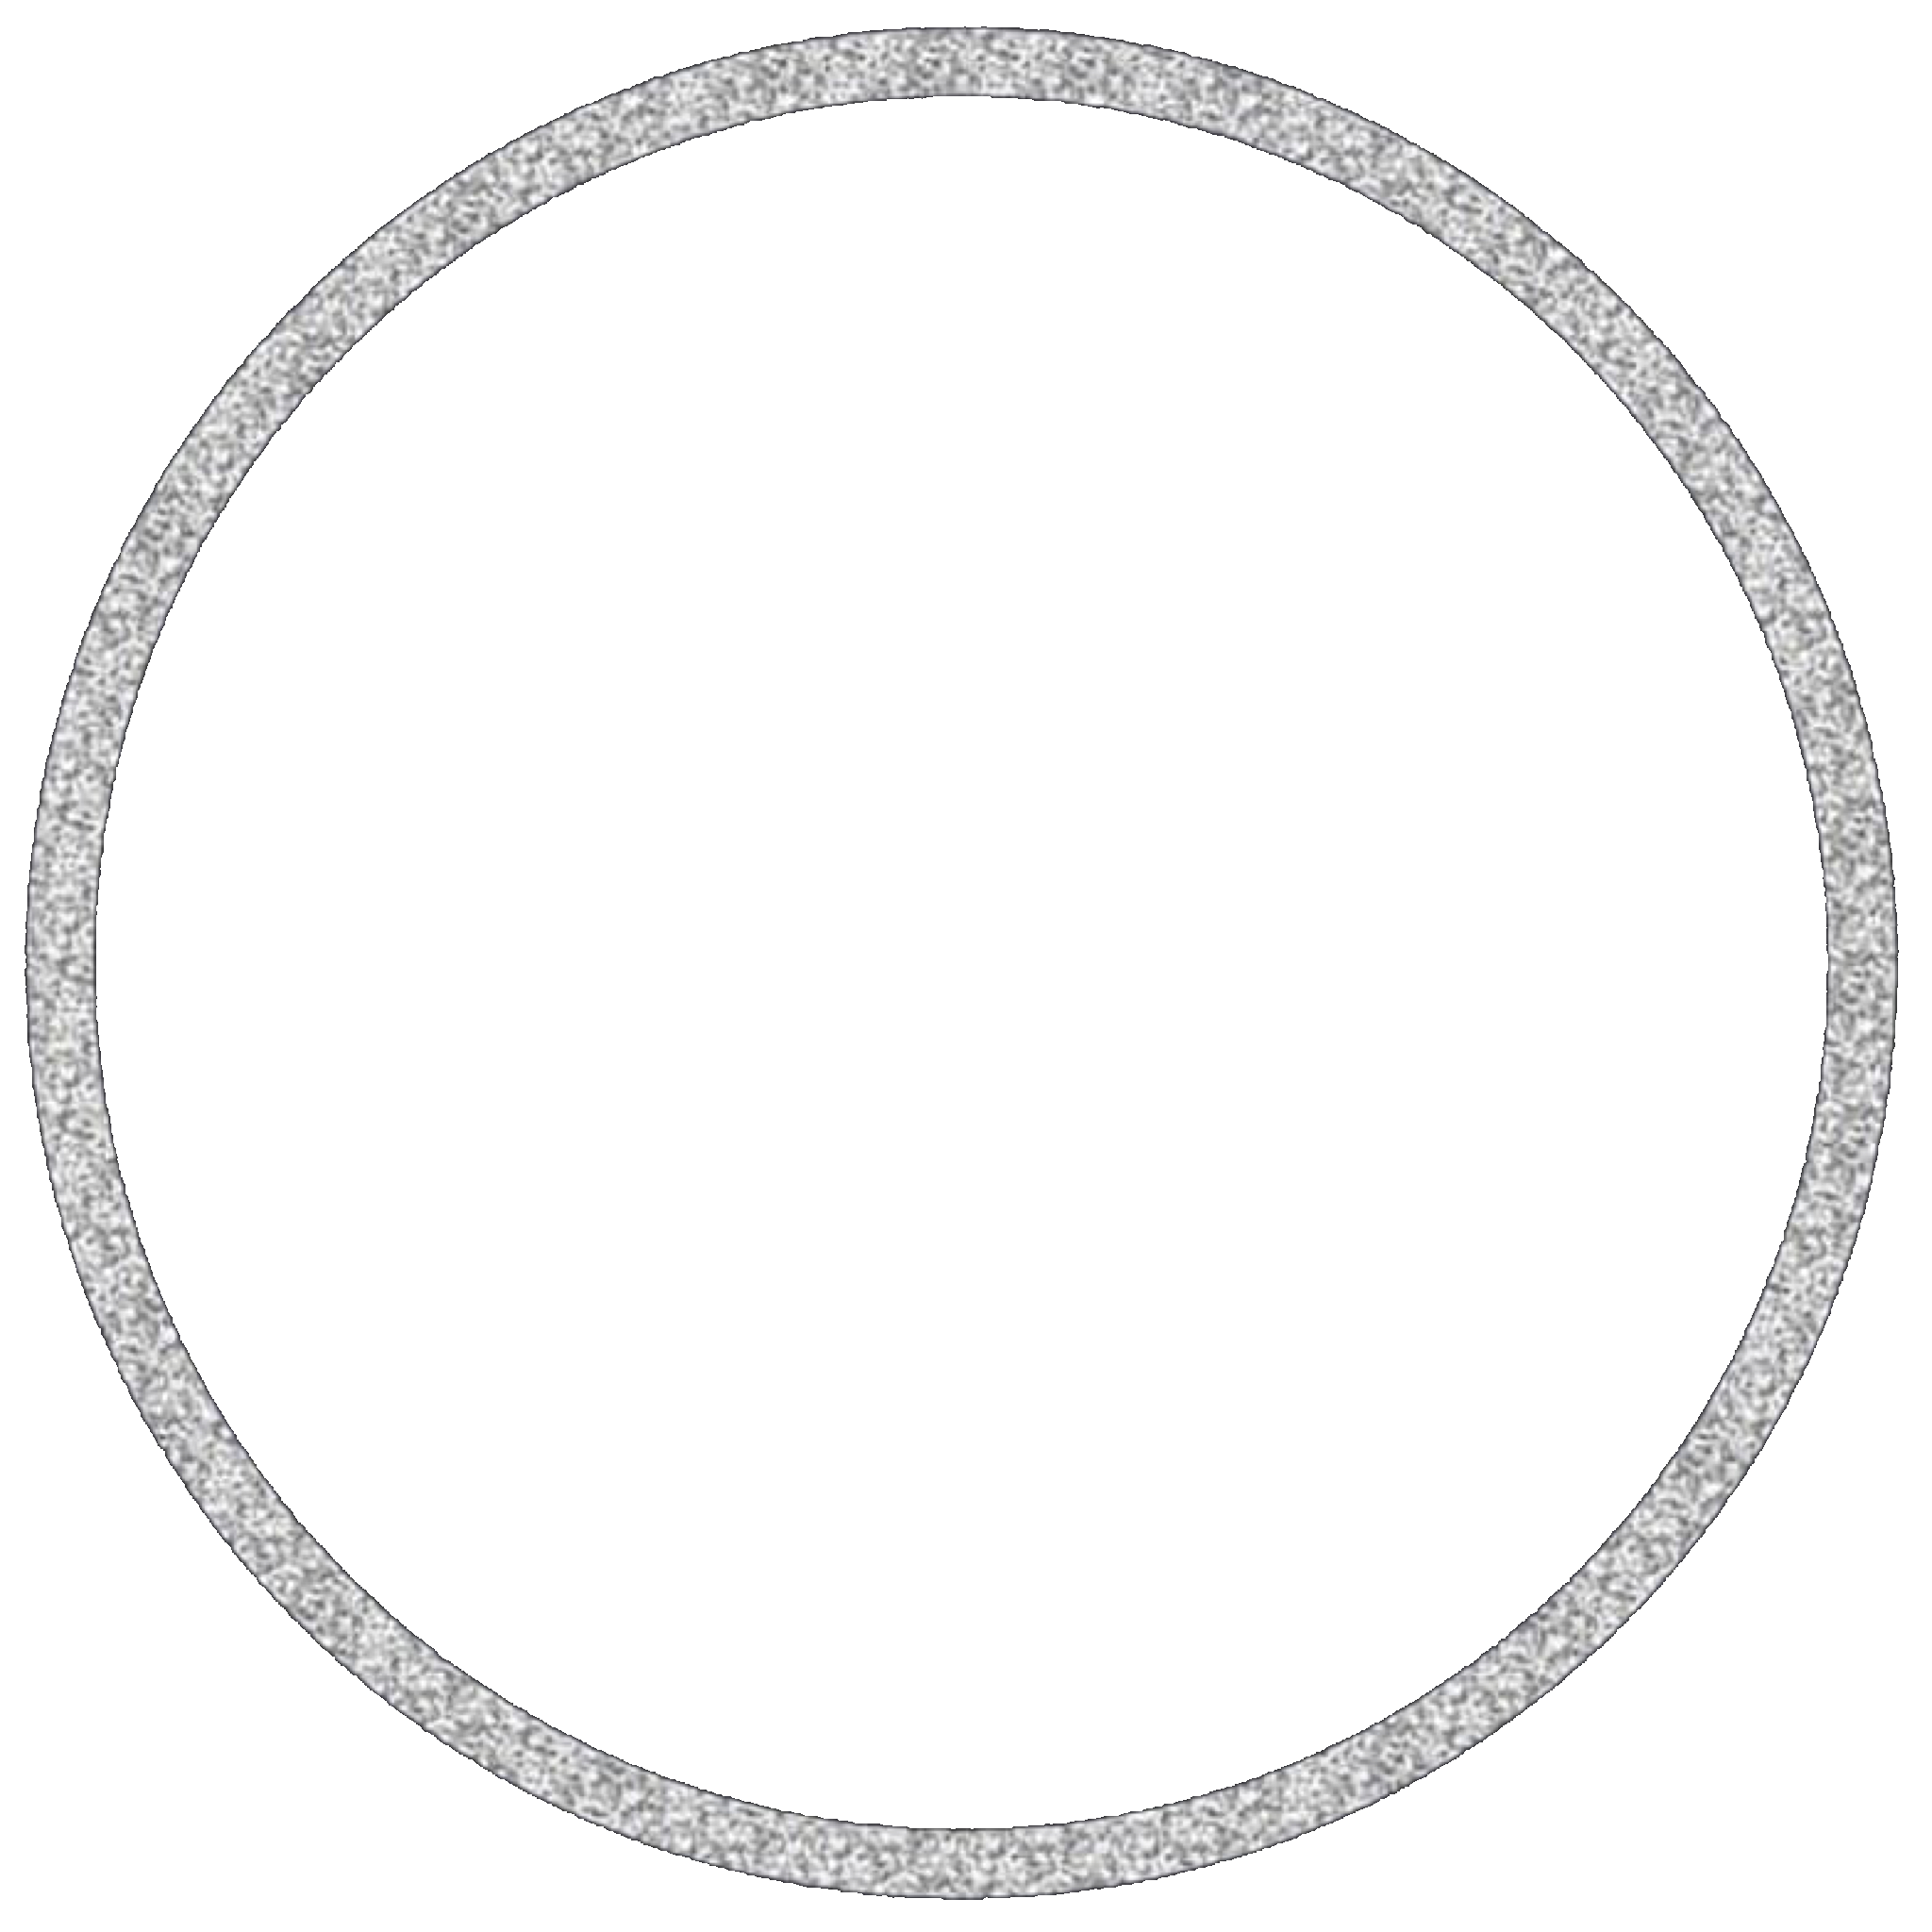 circle silver silvercircle glitter frame circleframe...